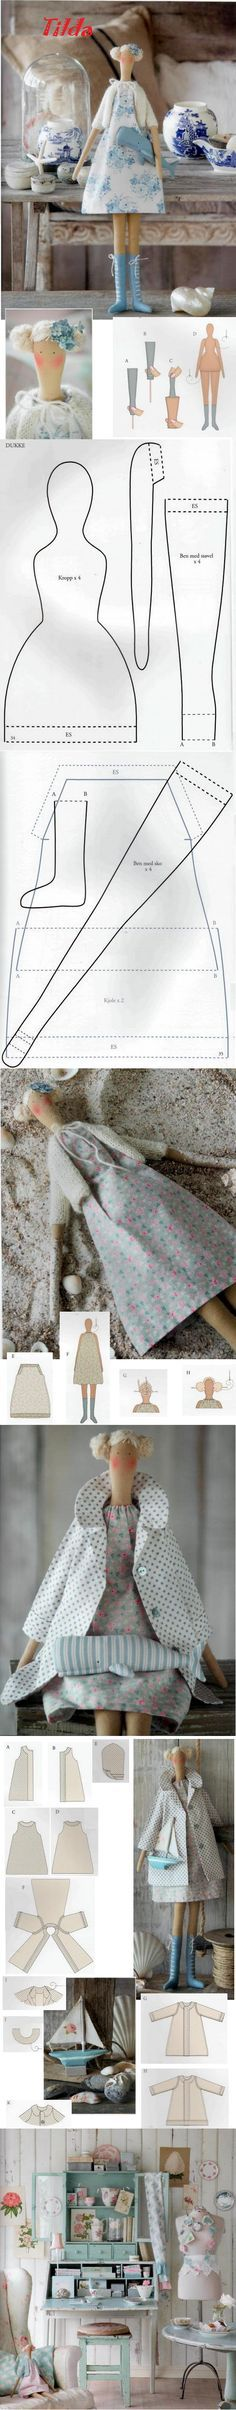 Tillda rag doll pattern for body clothing (from Tilda Somerliv Magazine) Doll Crafts, Diy Doll, Sewing Crafts, Sewing Projects, Sewing Tutorials, Sewing Dolls, Doll Tutorial, Stuffed Toys Patterns, Soft Dolls